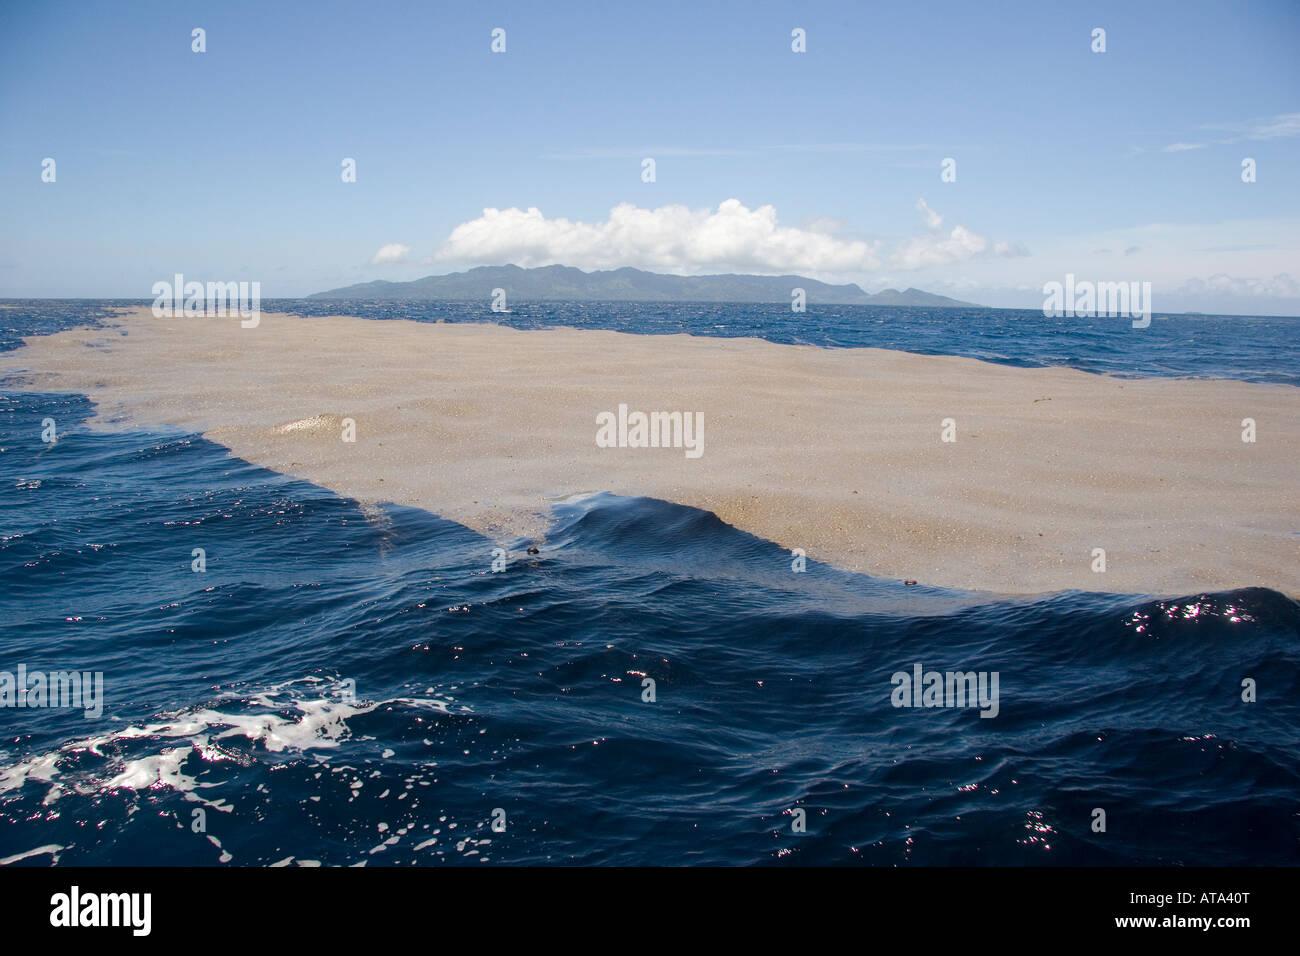 Pumice rafts of lightweight frothy volcanic rock, Bequ Lagoon, Fiji. - Stock Image